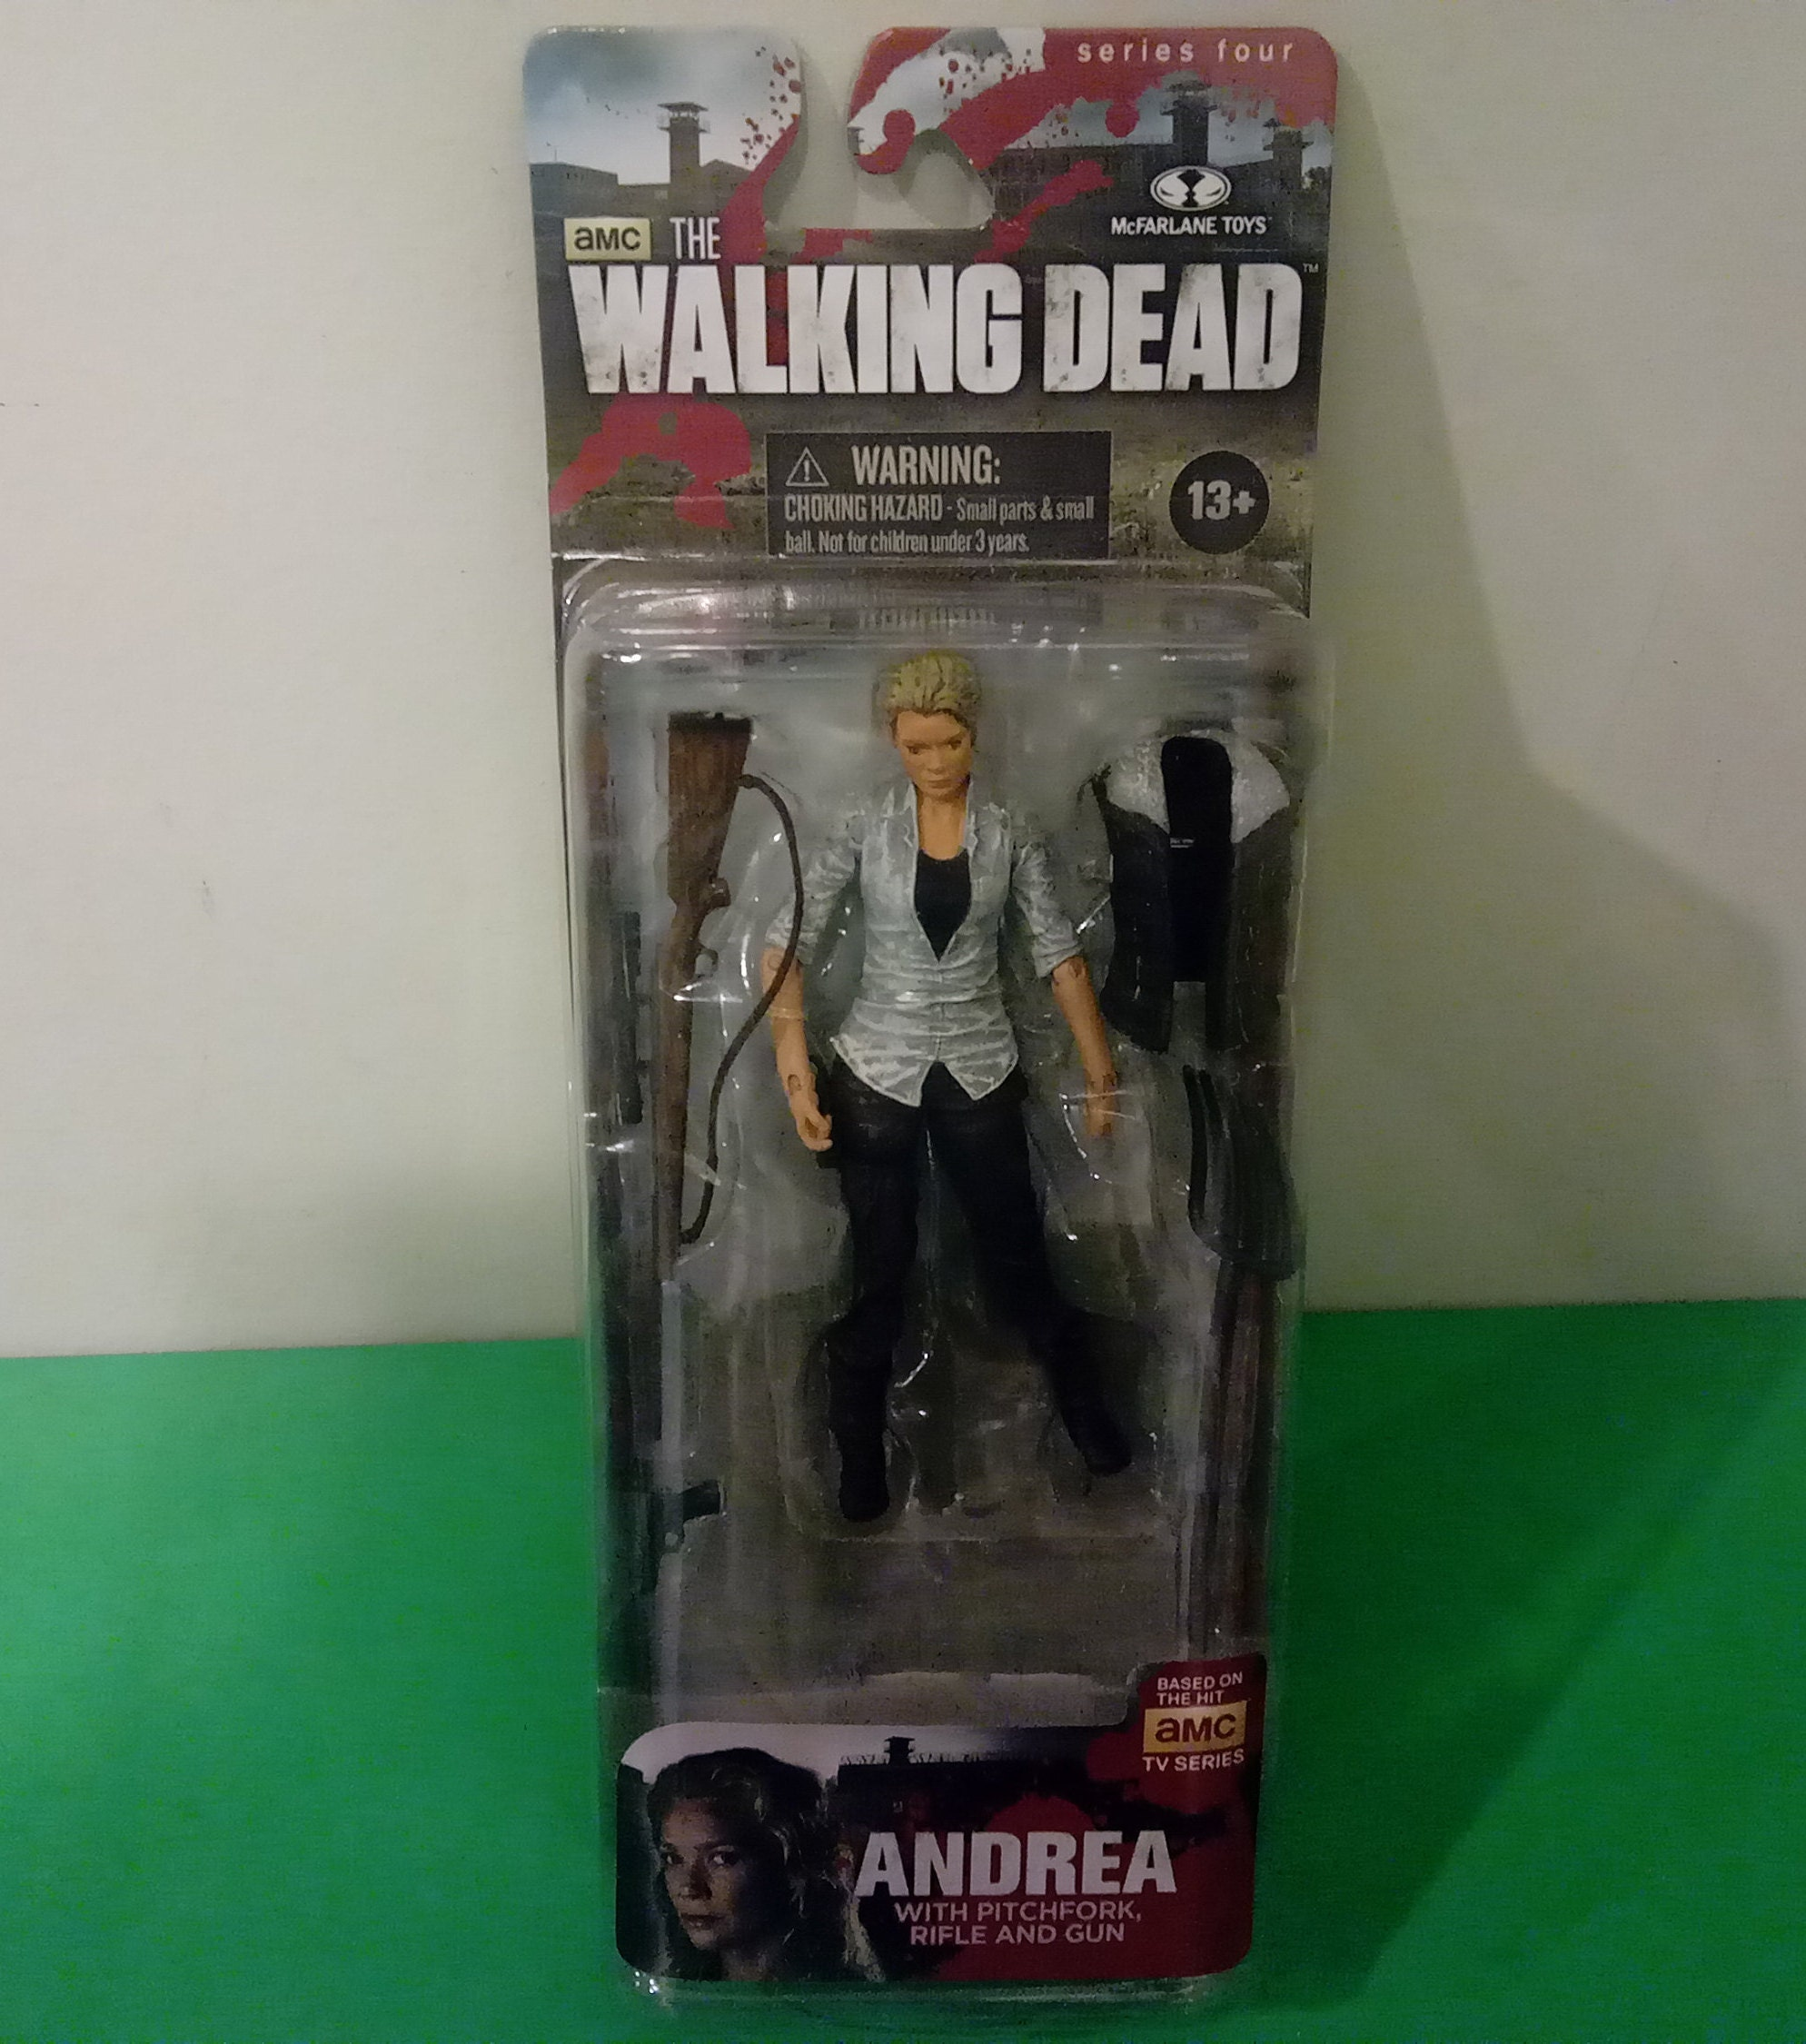 McFarlane Toys, The Walking Dead AMC TV Series 4, Andrea Action